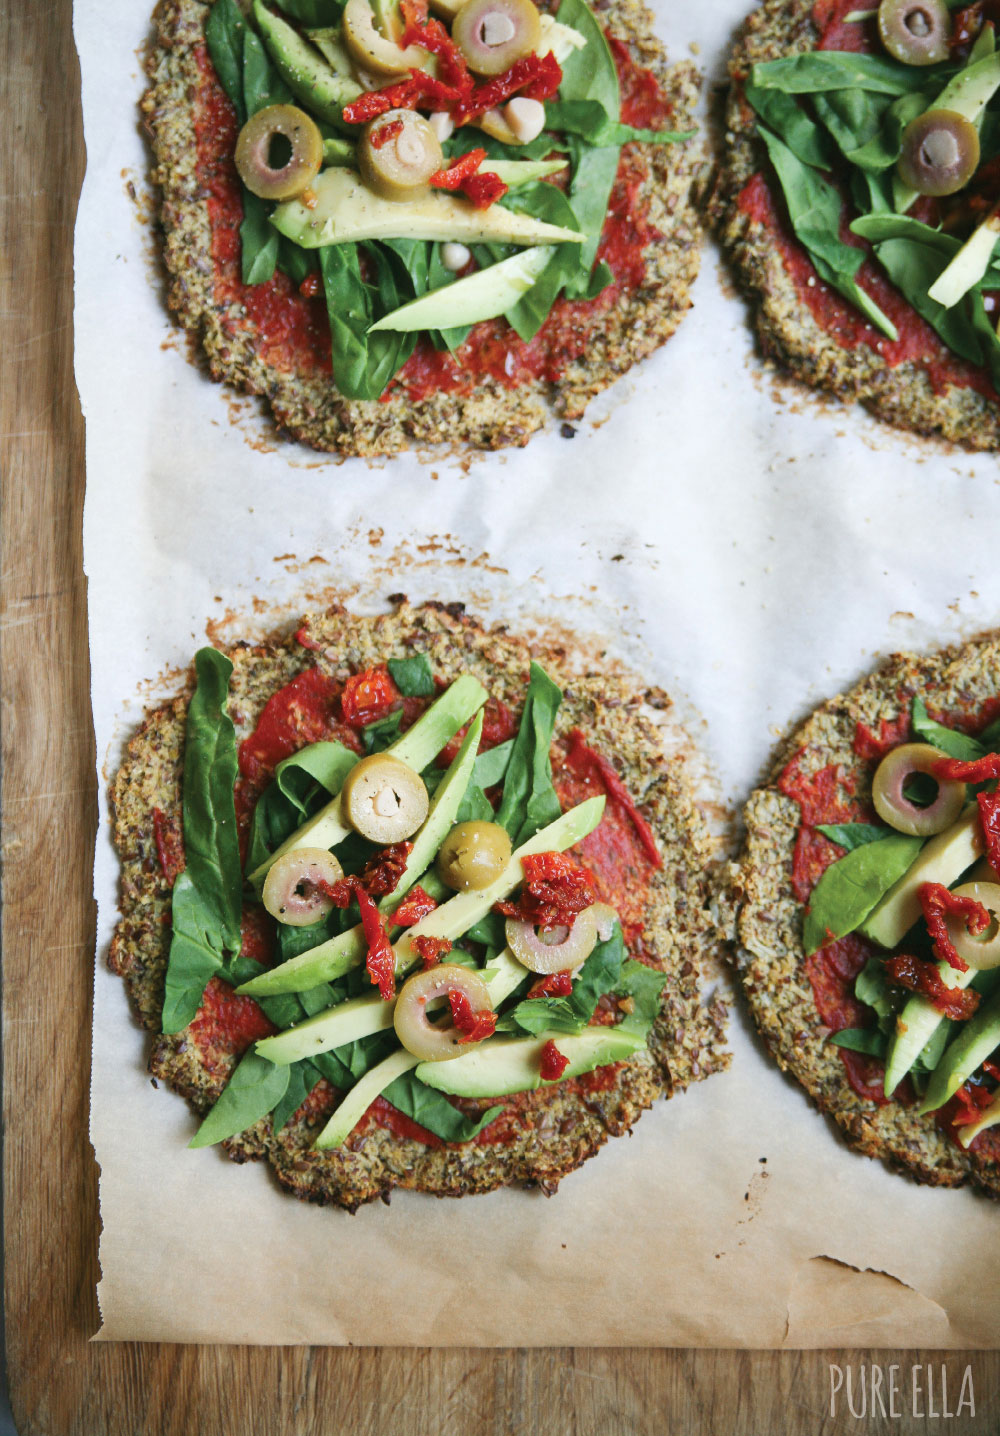 Pure-Ella-gluten-free-paleo-vegan-cauliflower-crust-pizza2